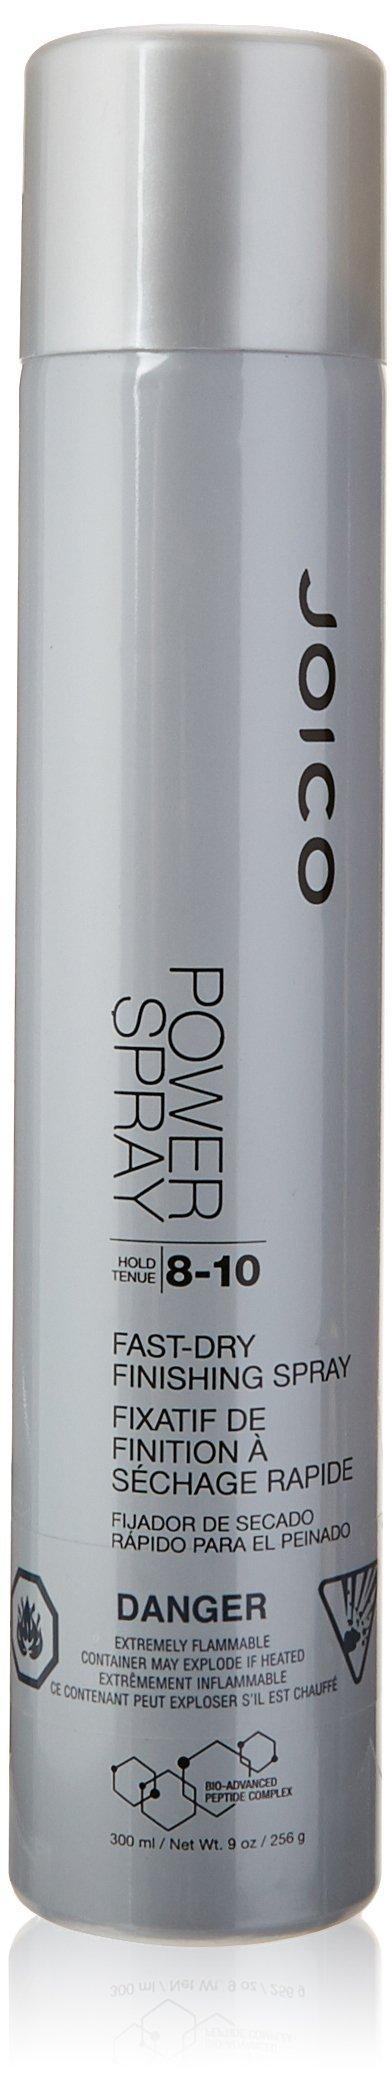 Joico Power Spray Fast-Dry Finishing Spray, 9 Ounce